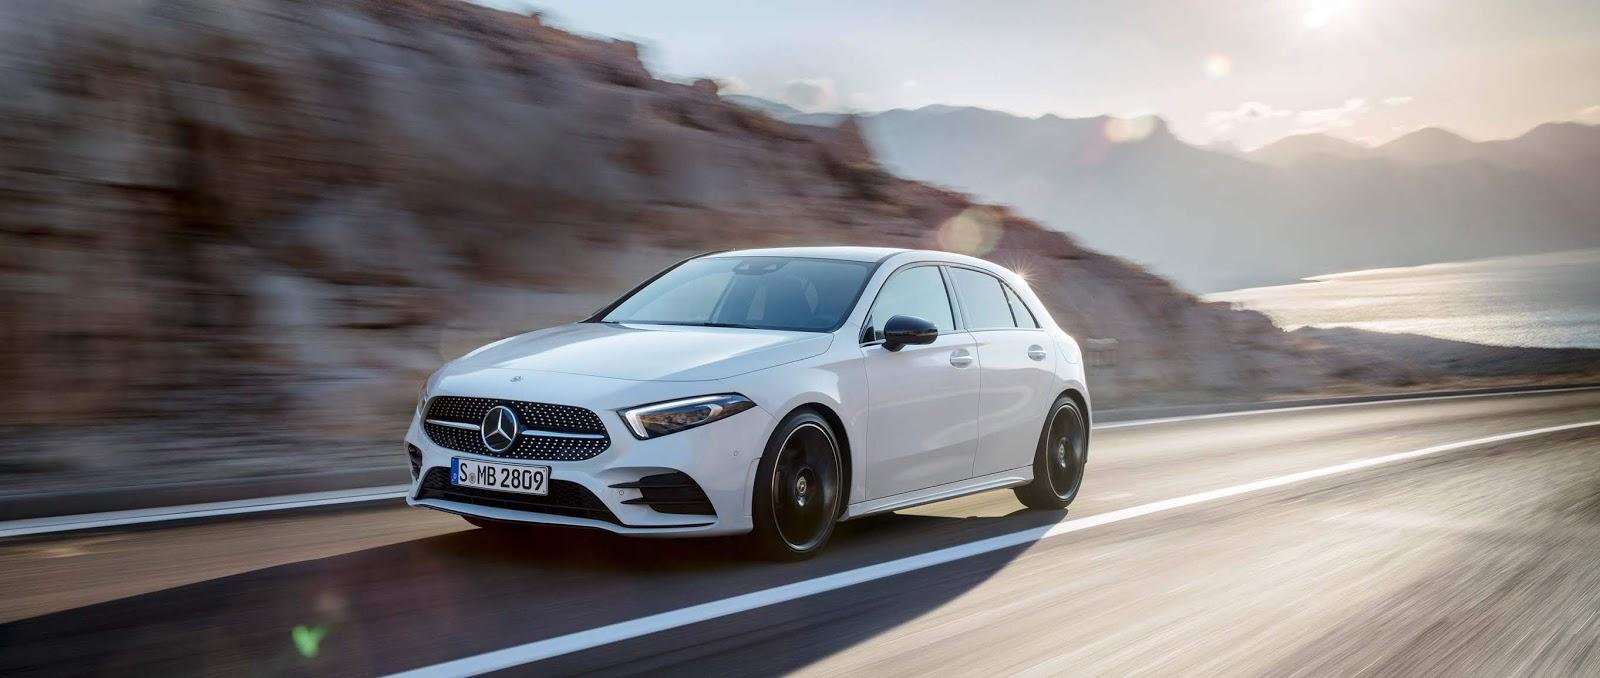 Best Car 2019: Ποια είναι τα καλύτερα αυτοκίνητα της χρονιάς!